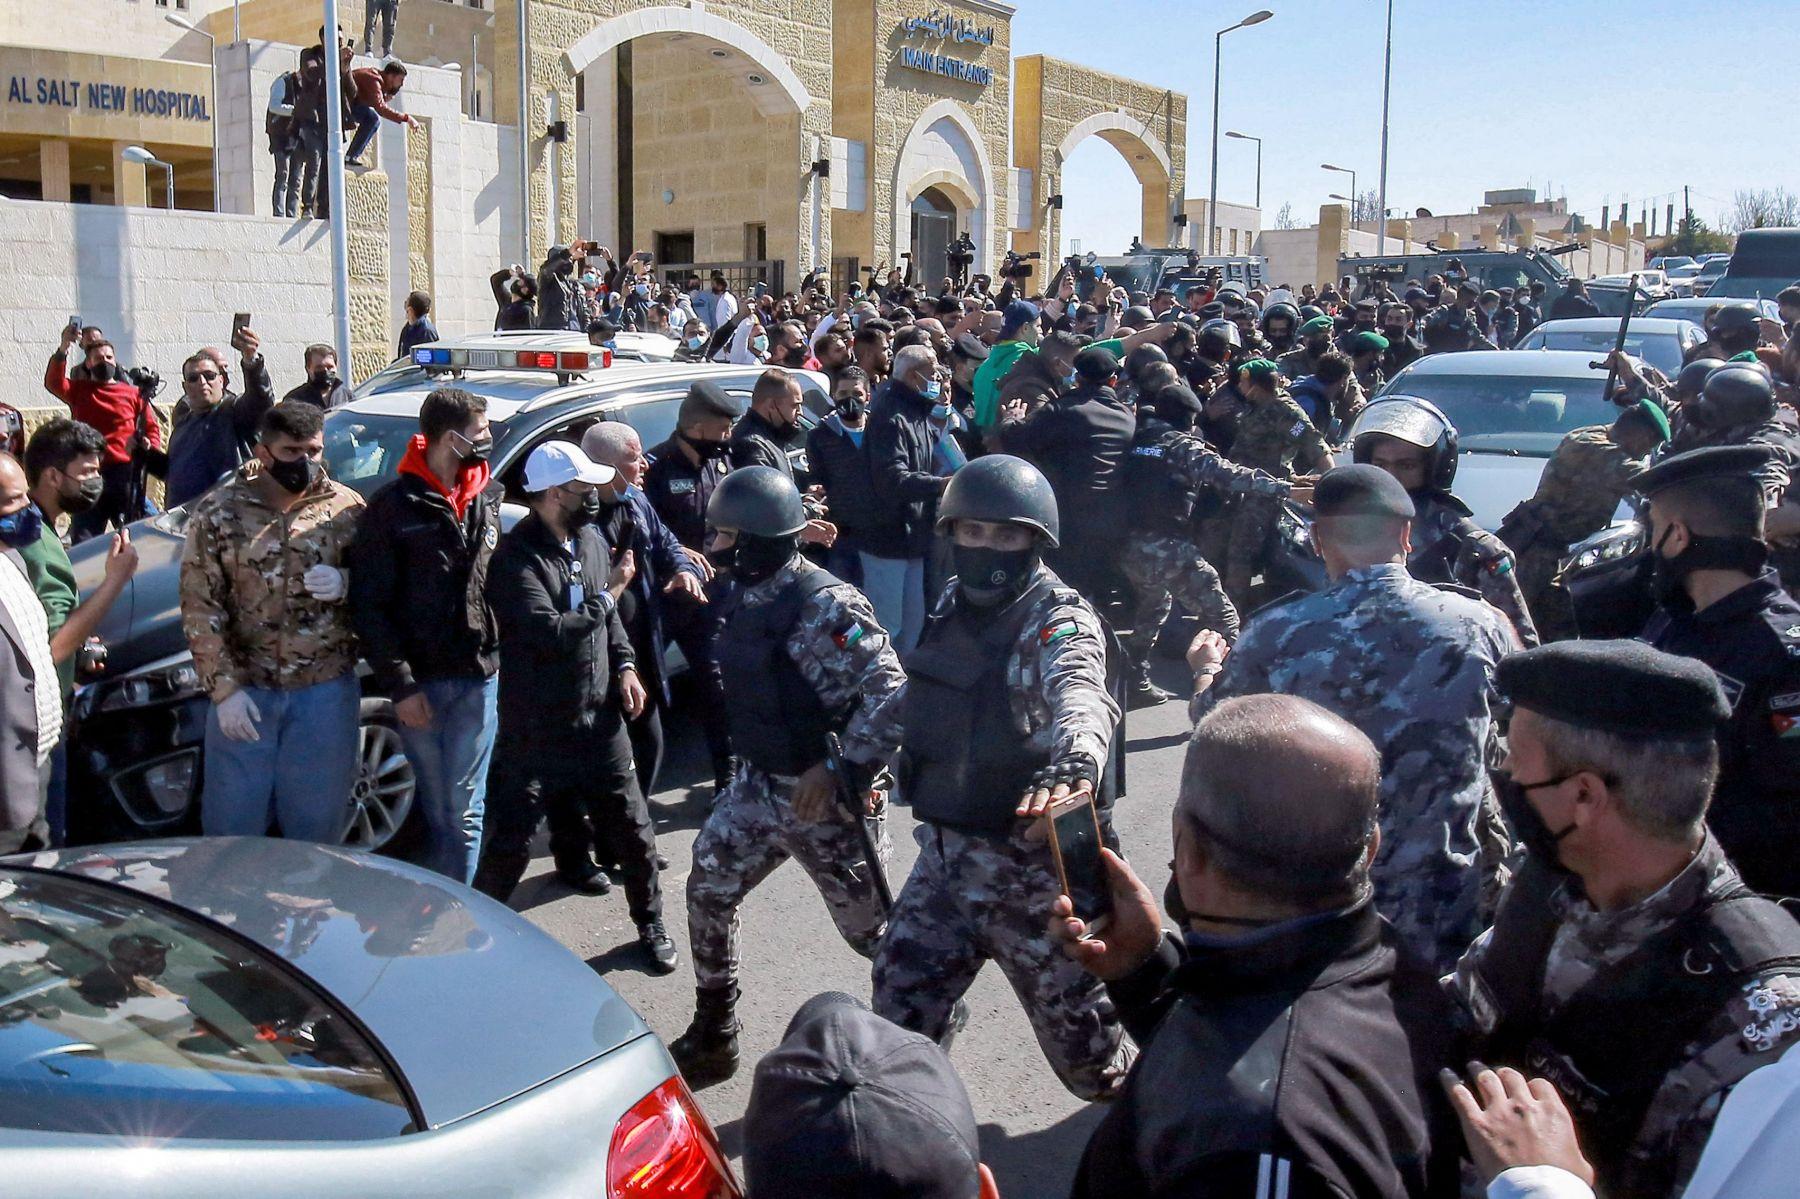 AFP/Khalil MAZRAAWI